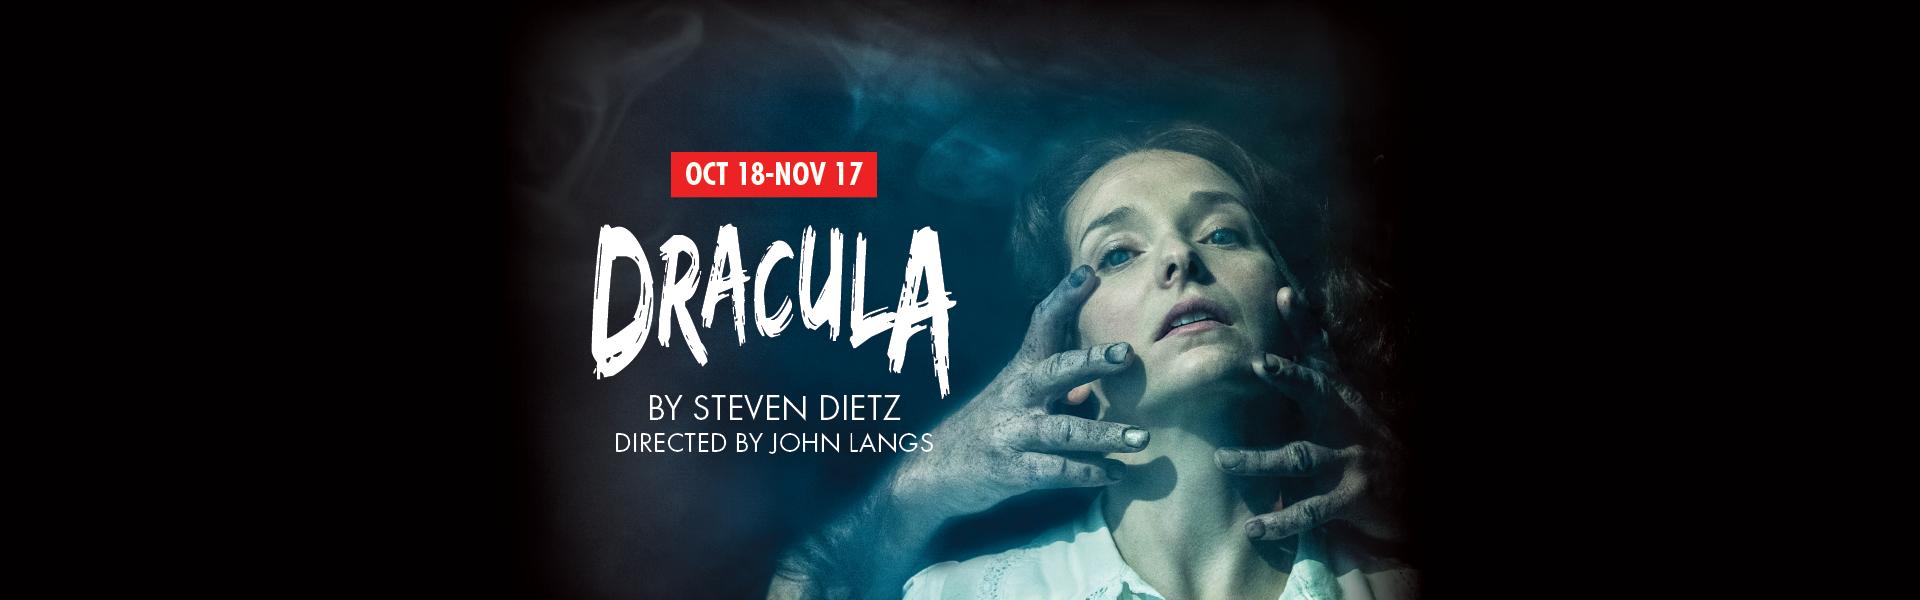 2019 Dracula Banner Image